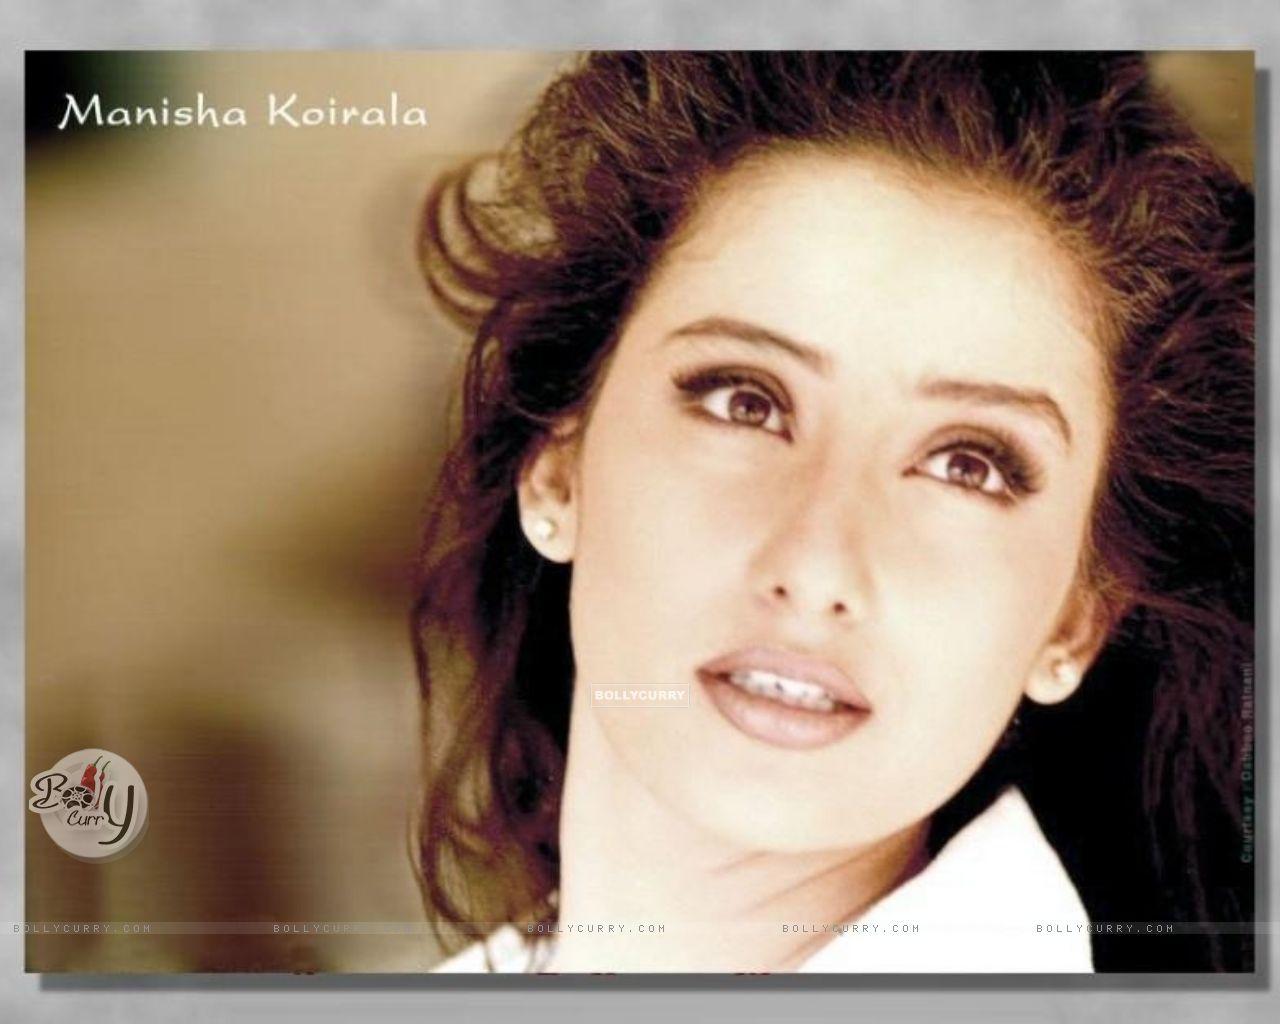 Manisha Koirala - Photo Gallery